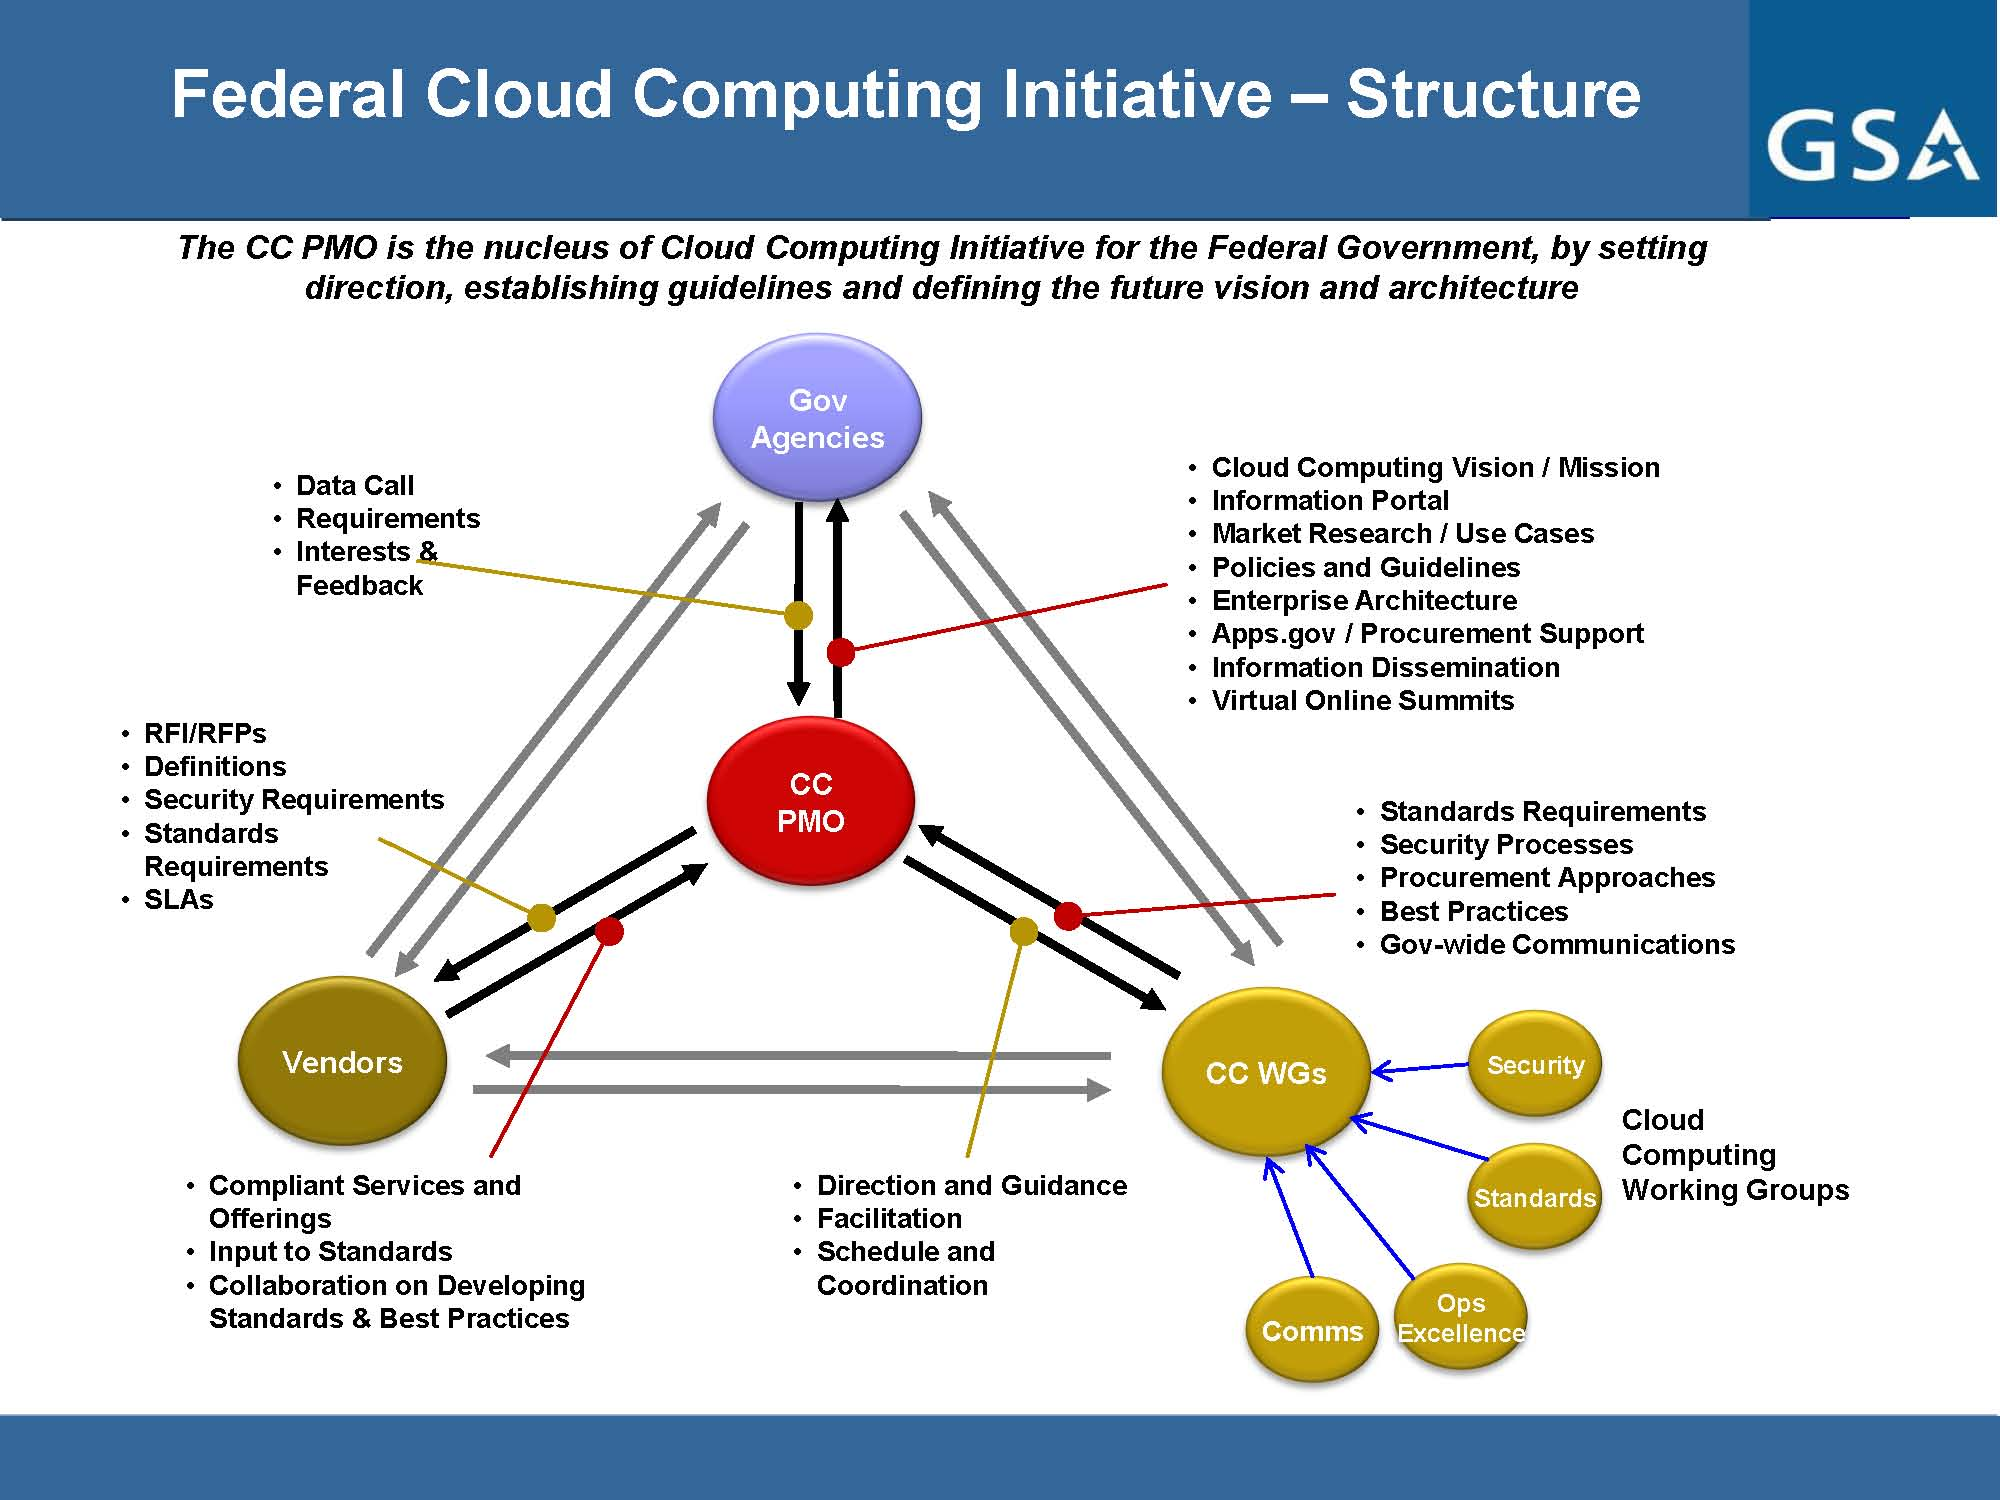 Cloud Computing Program Management Office